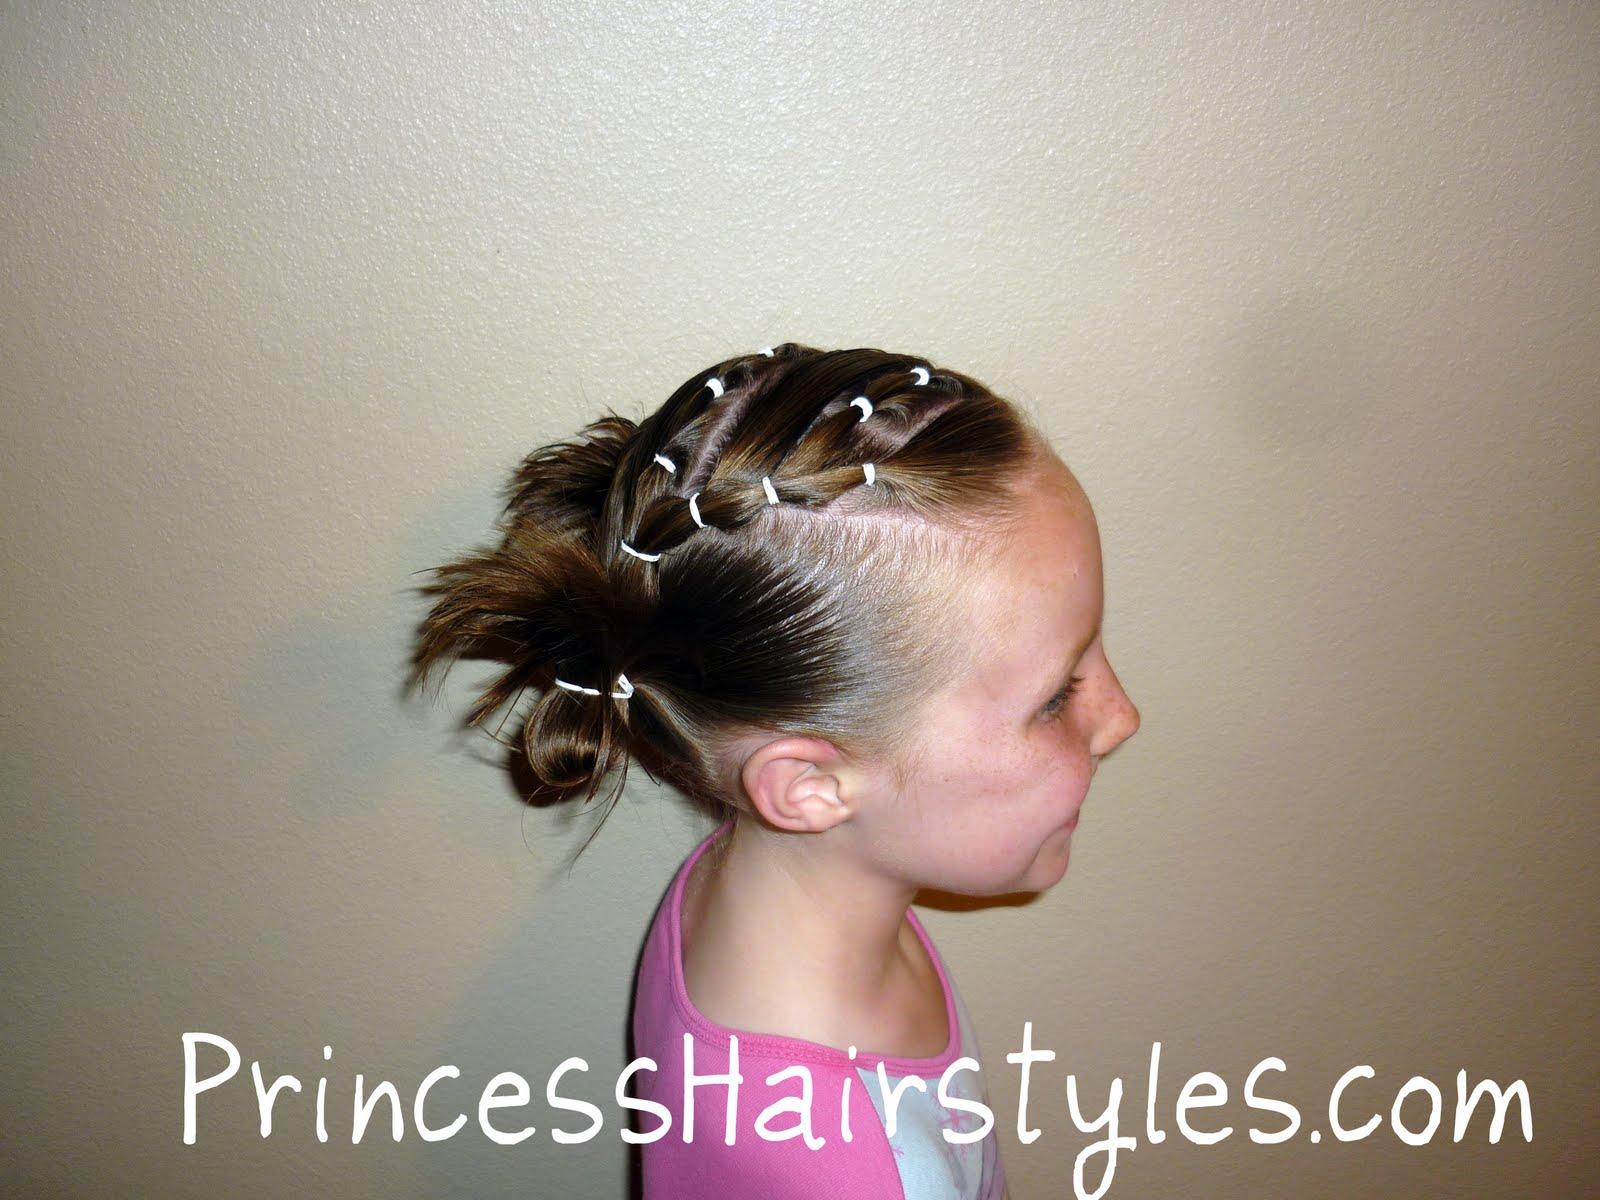 Incredible Chutes And Ladders Hairdo Hairstyles For Girls Princess Hairstyles Short Hairstyles For Black Women Fulllsitofus